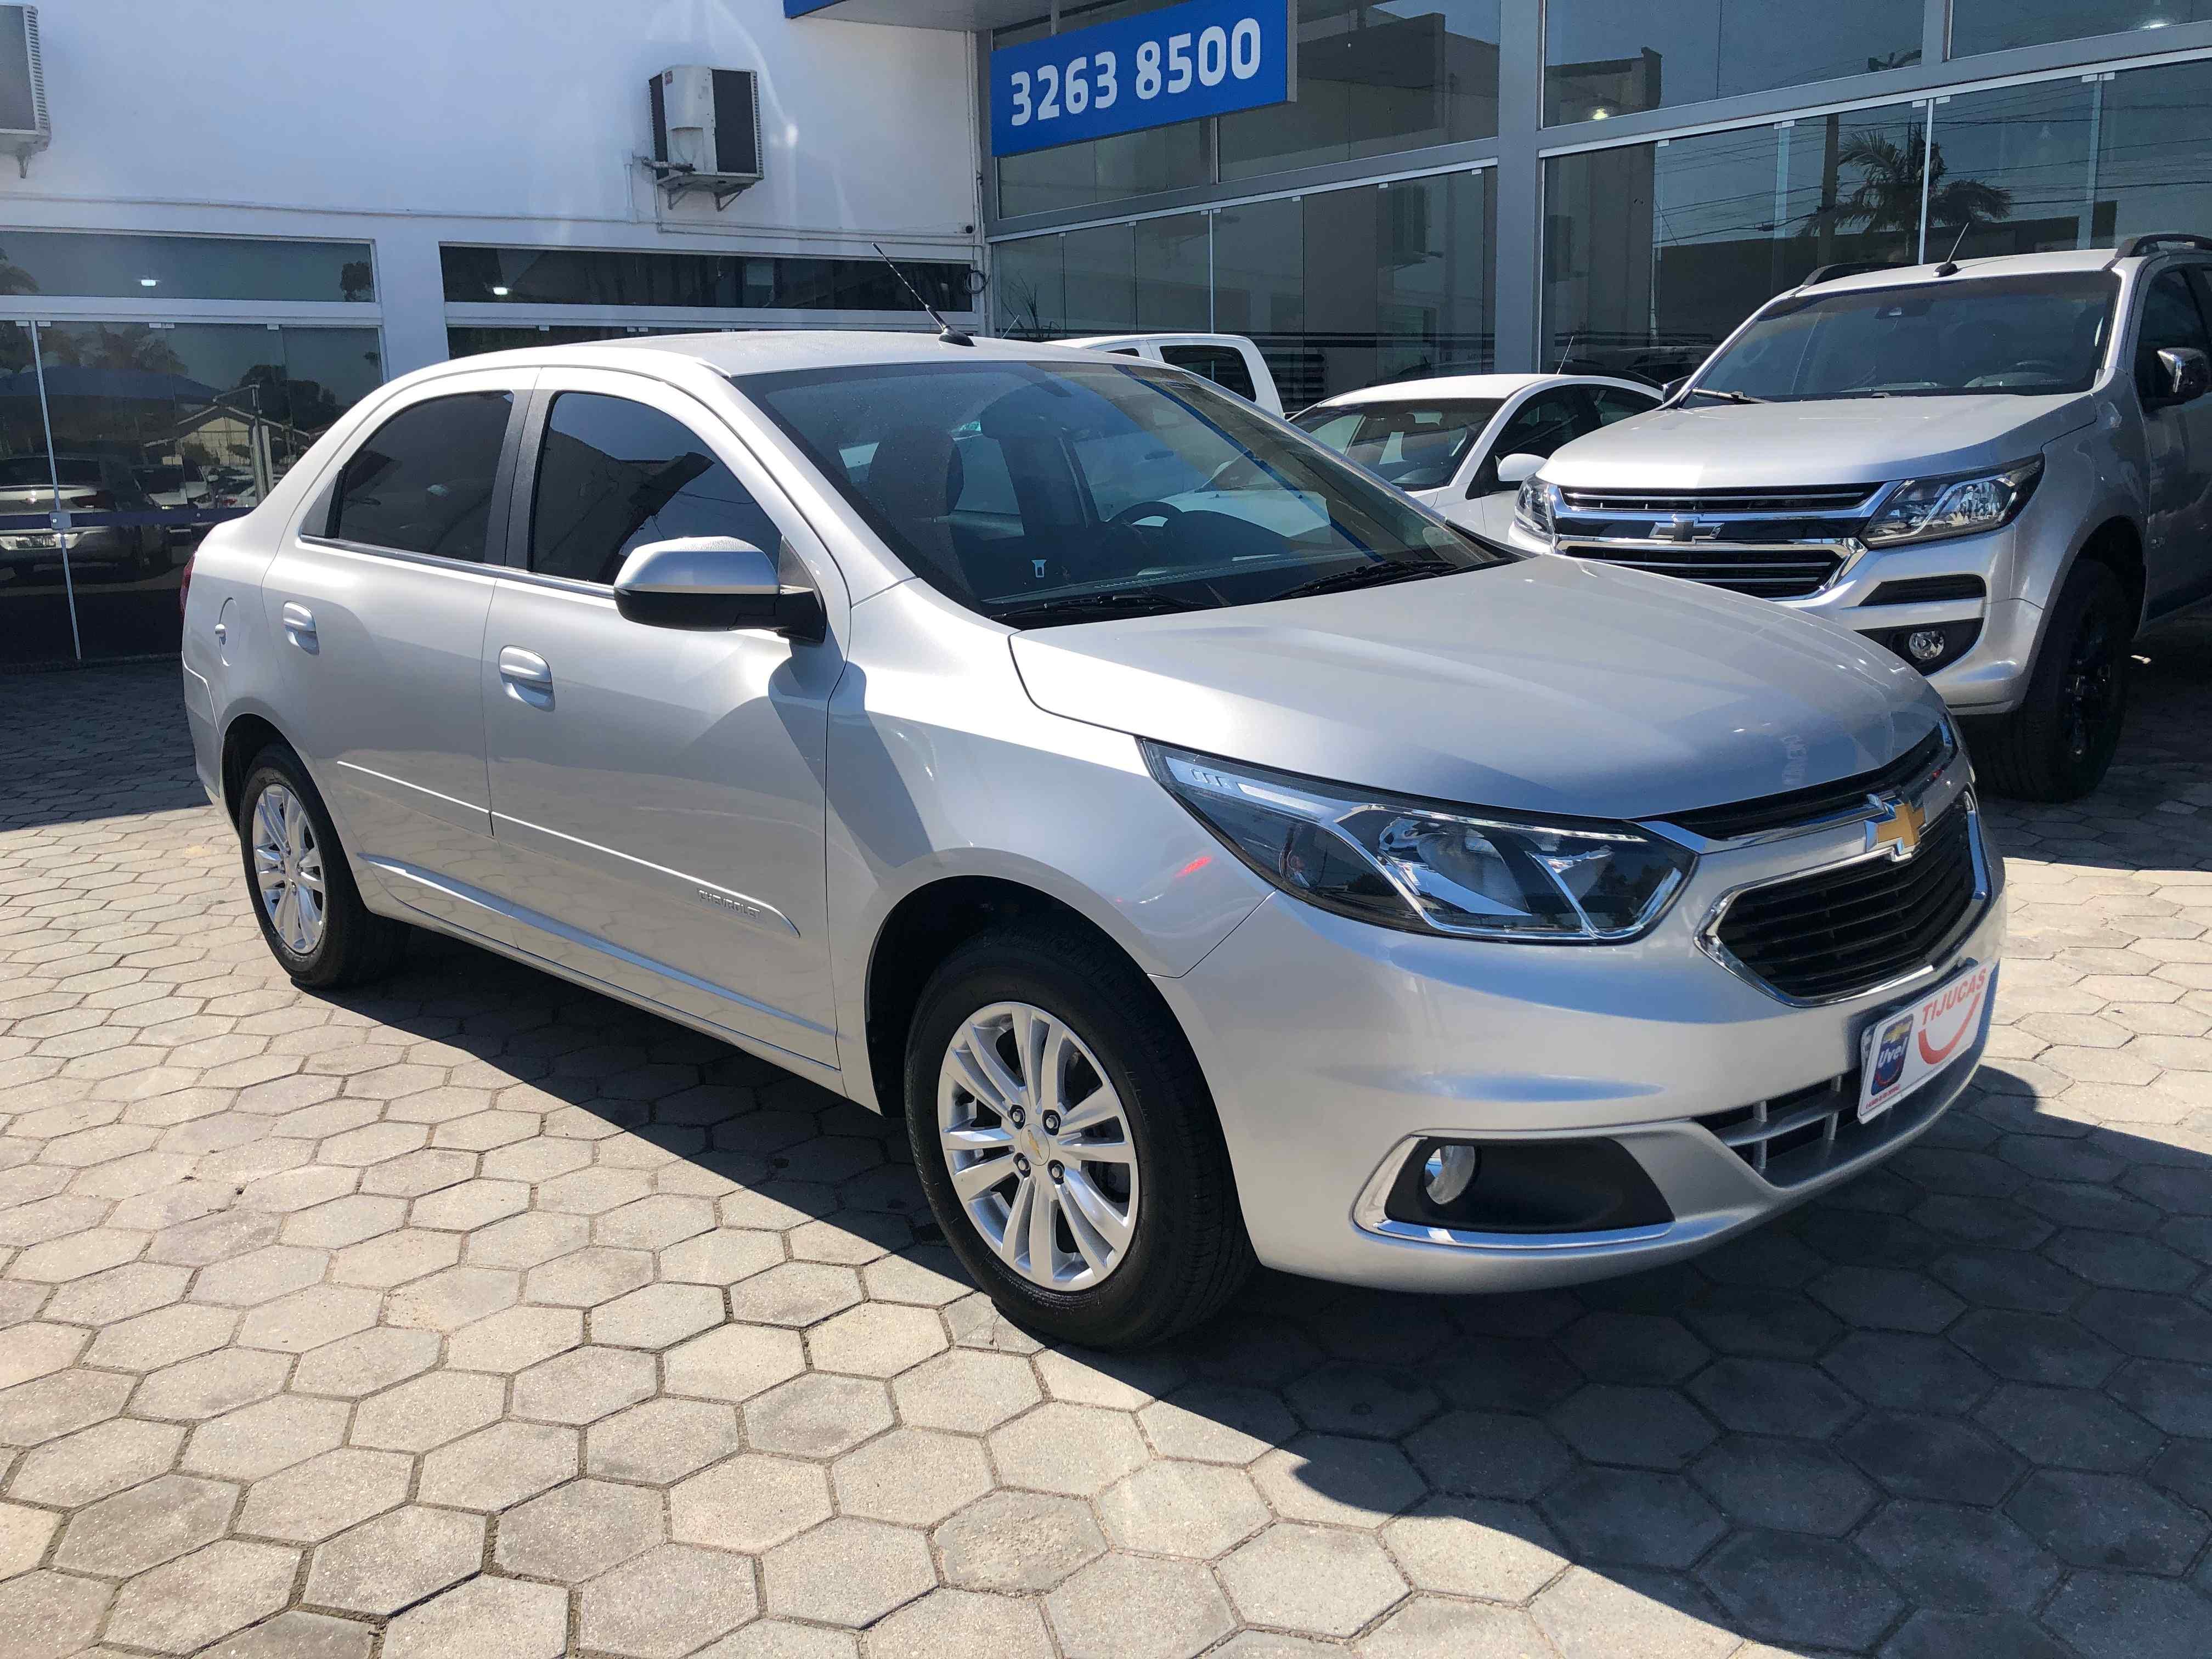 Chevrolet Cobalt LTZ 1.8L 2016